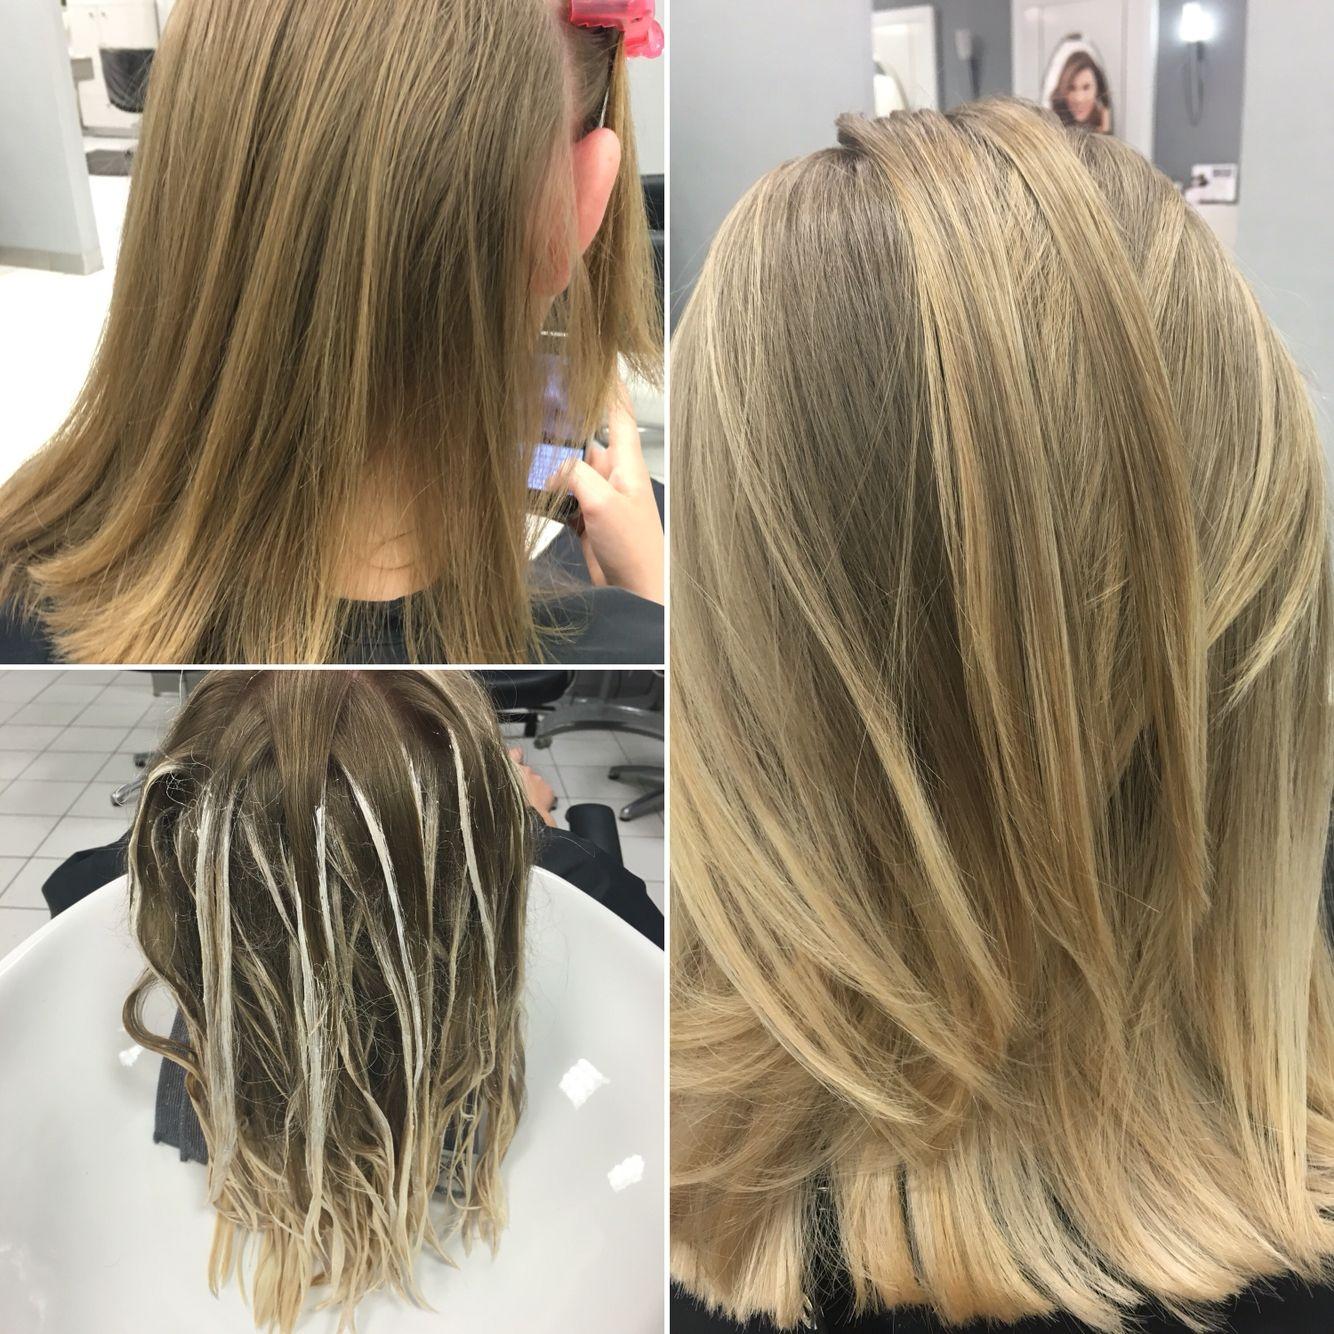 Bayalage Ulta Beauty Hairstylist Elizabeth Sanchez Beauty Ulta Beauty Hair Styles